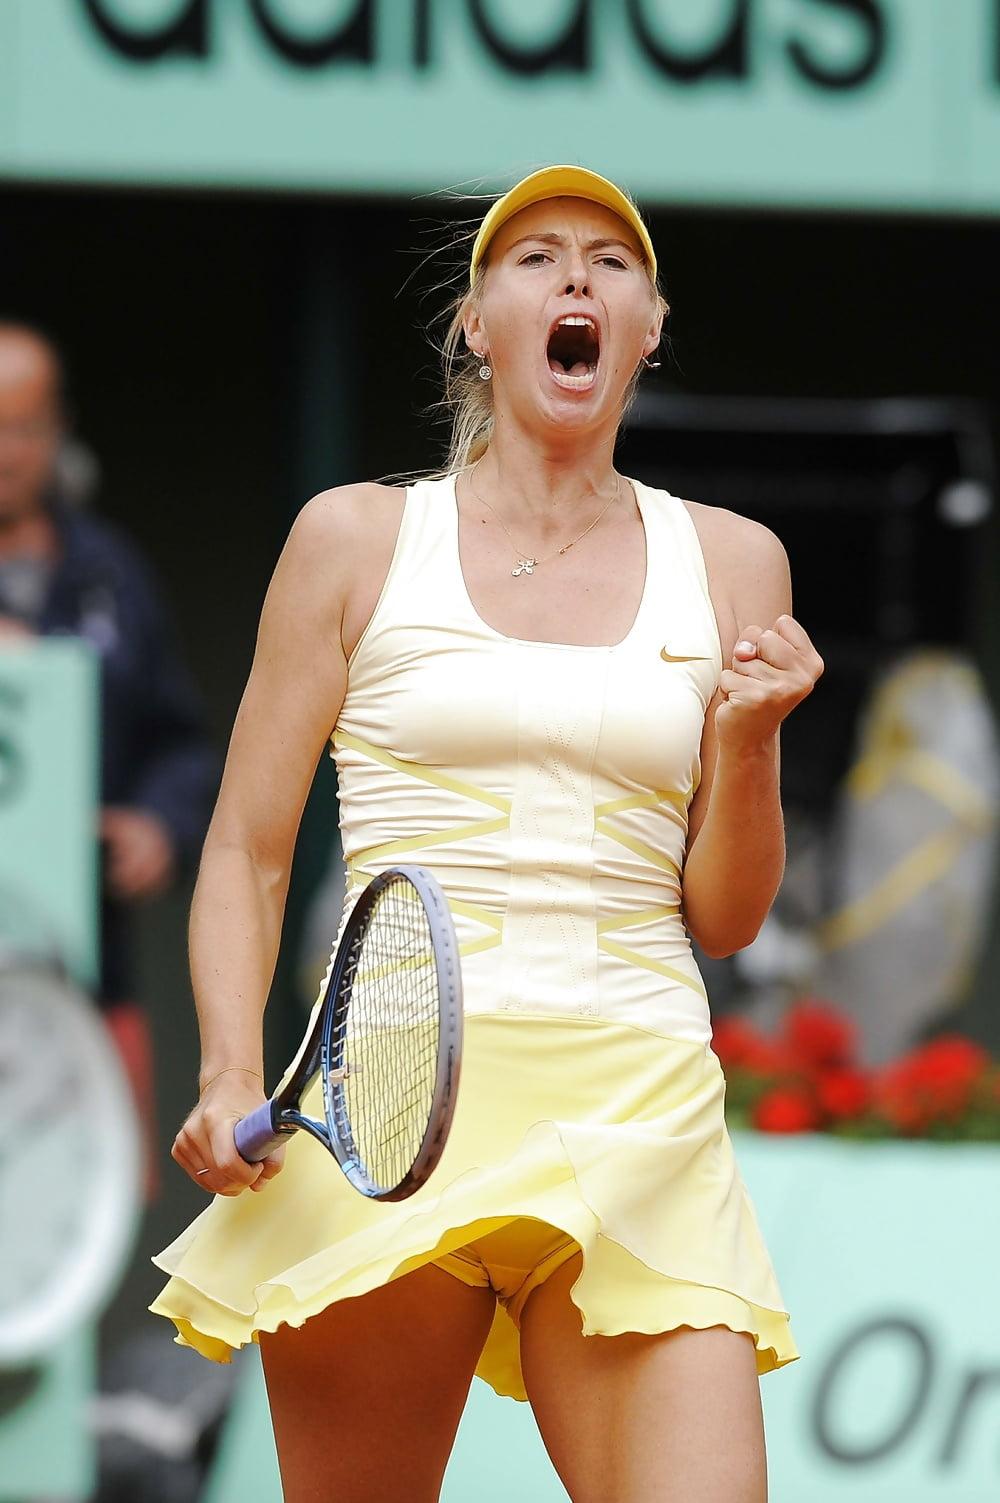 Female tennis player upskirt